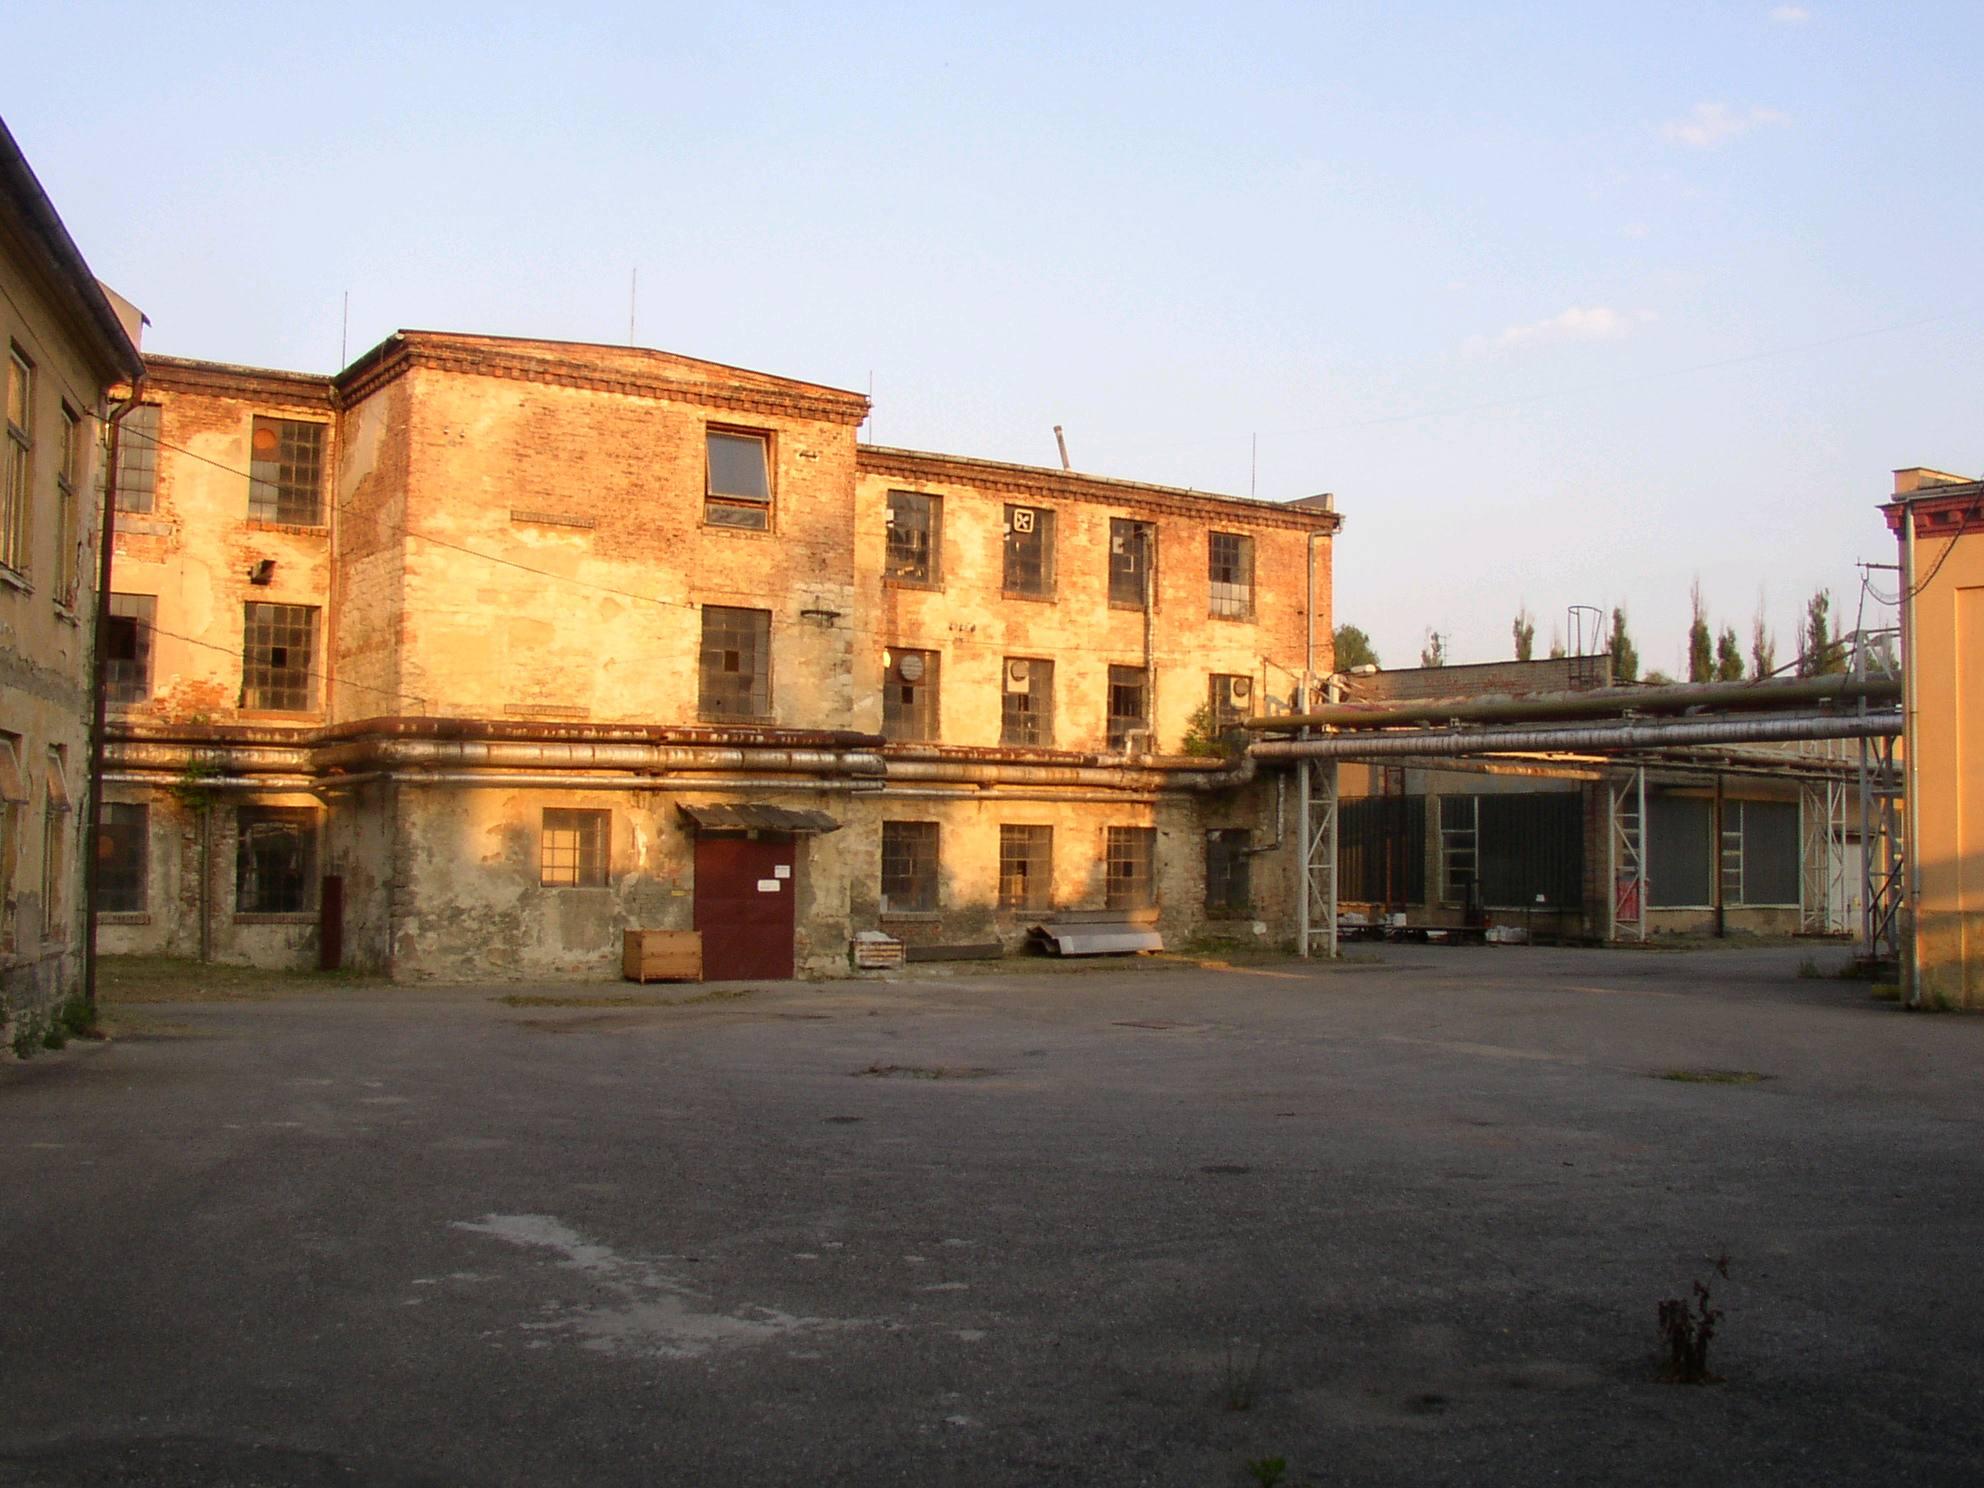 images emilie pelzl brn283nec schindlers fabrik